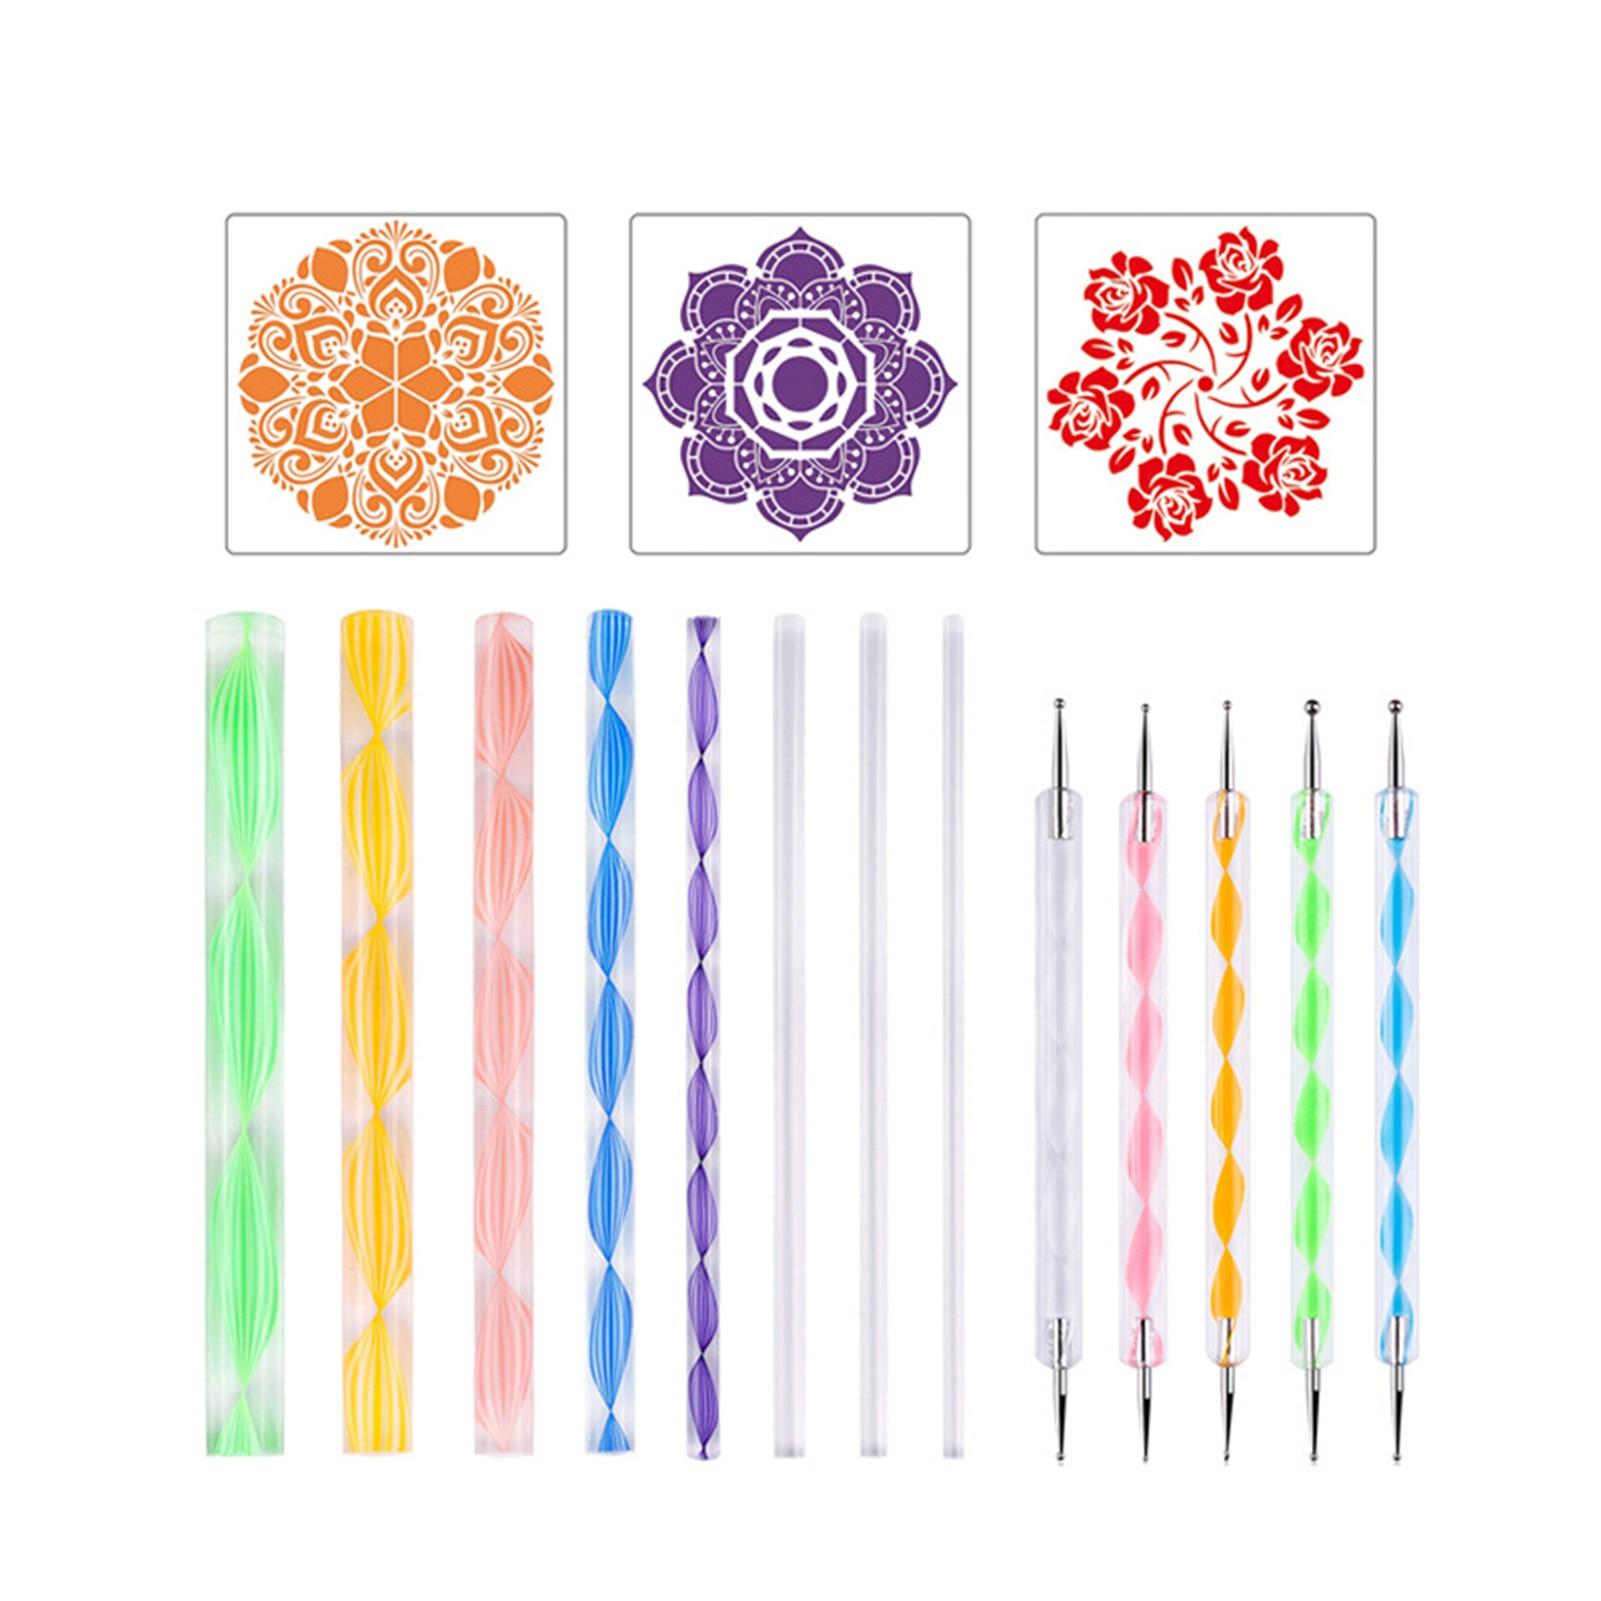 6/18/34/35-piece Mandala Stippling Tool Pen Set Painting Tool Set Reusable Unique DIY Stippling Equipment Kit